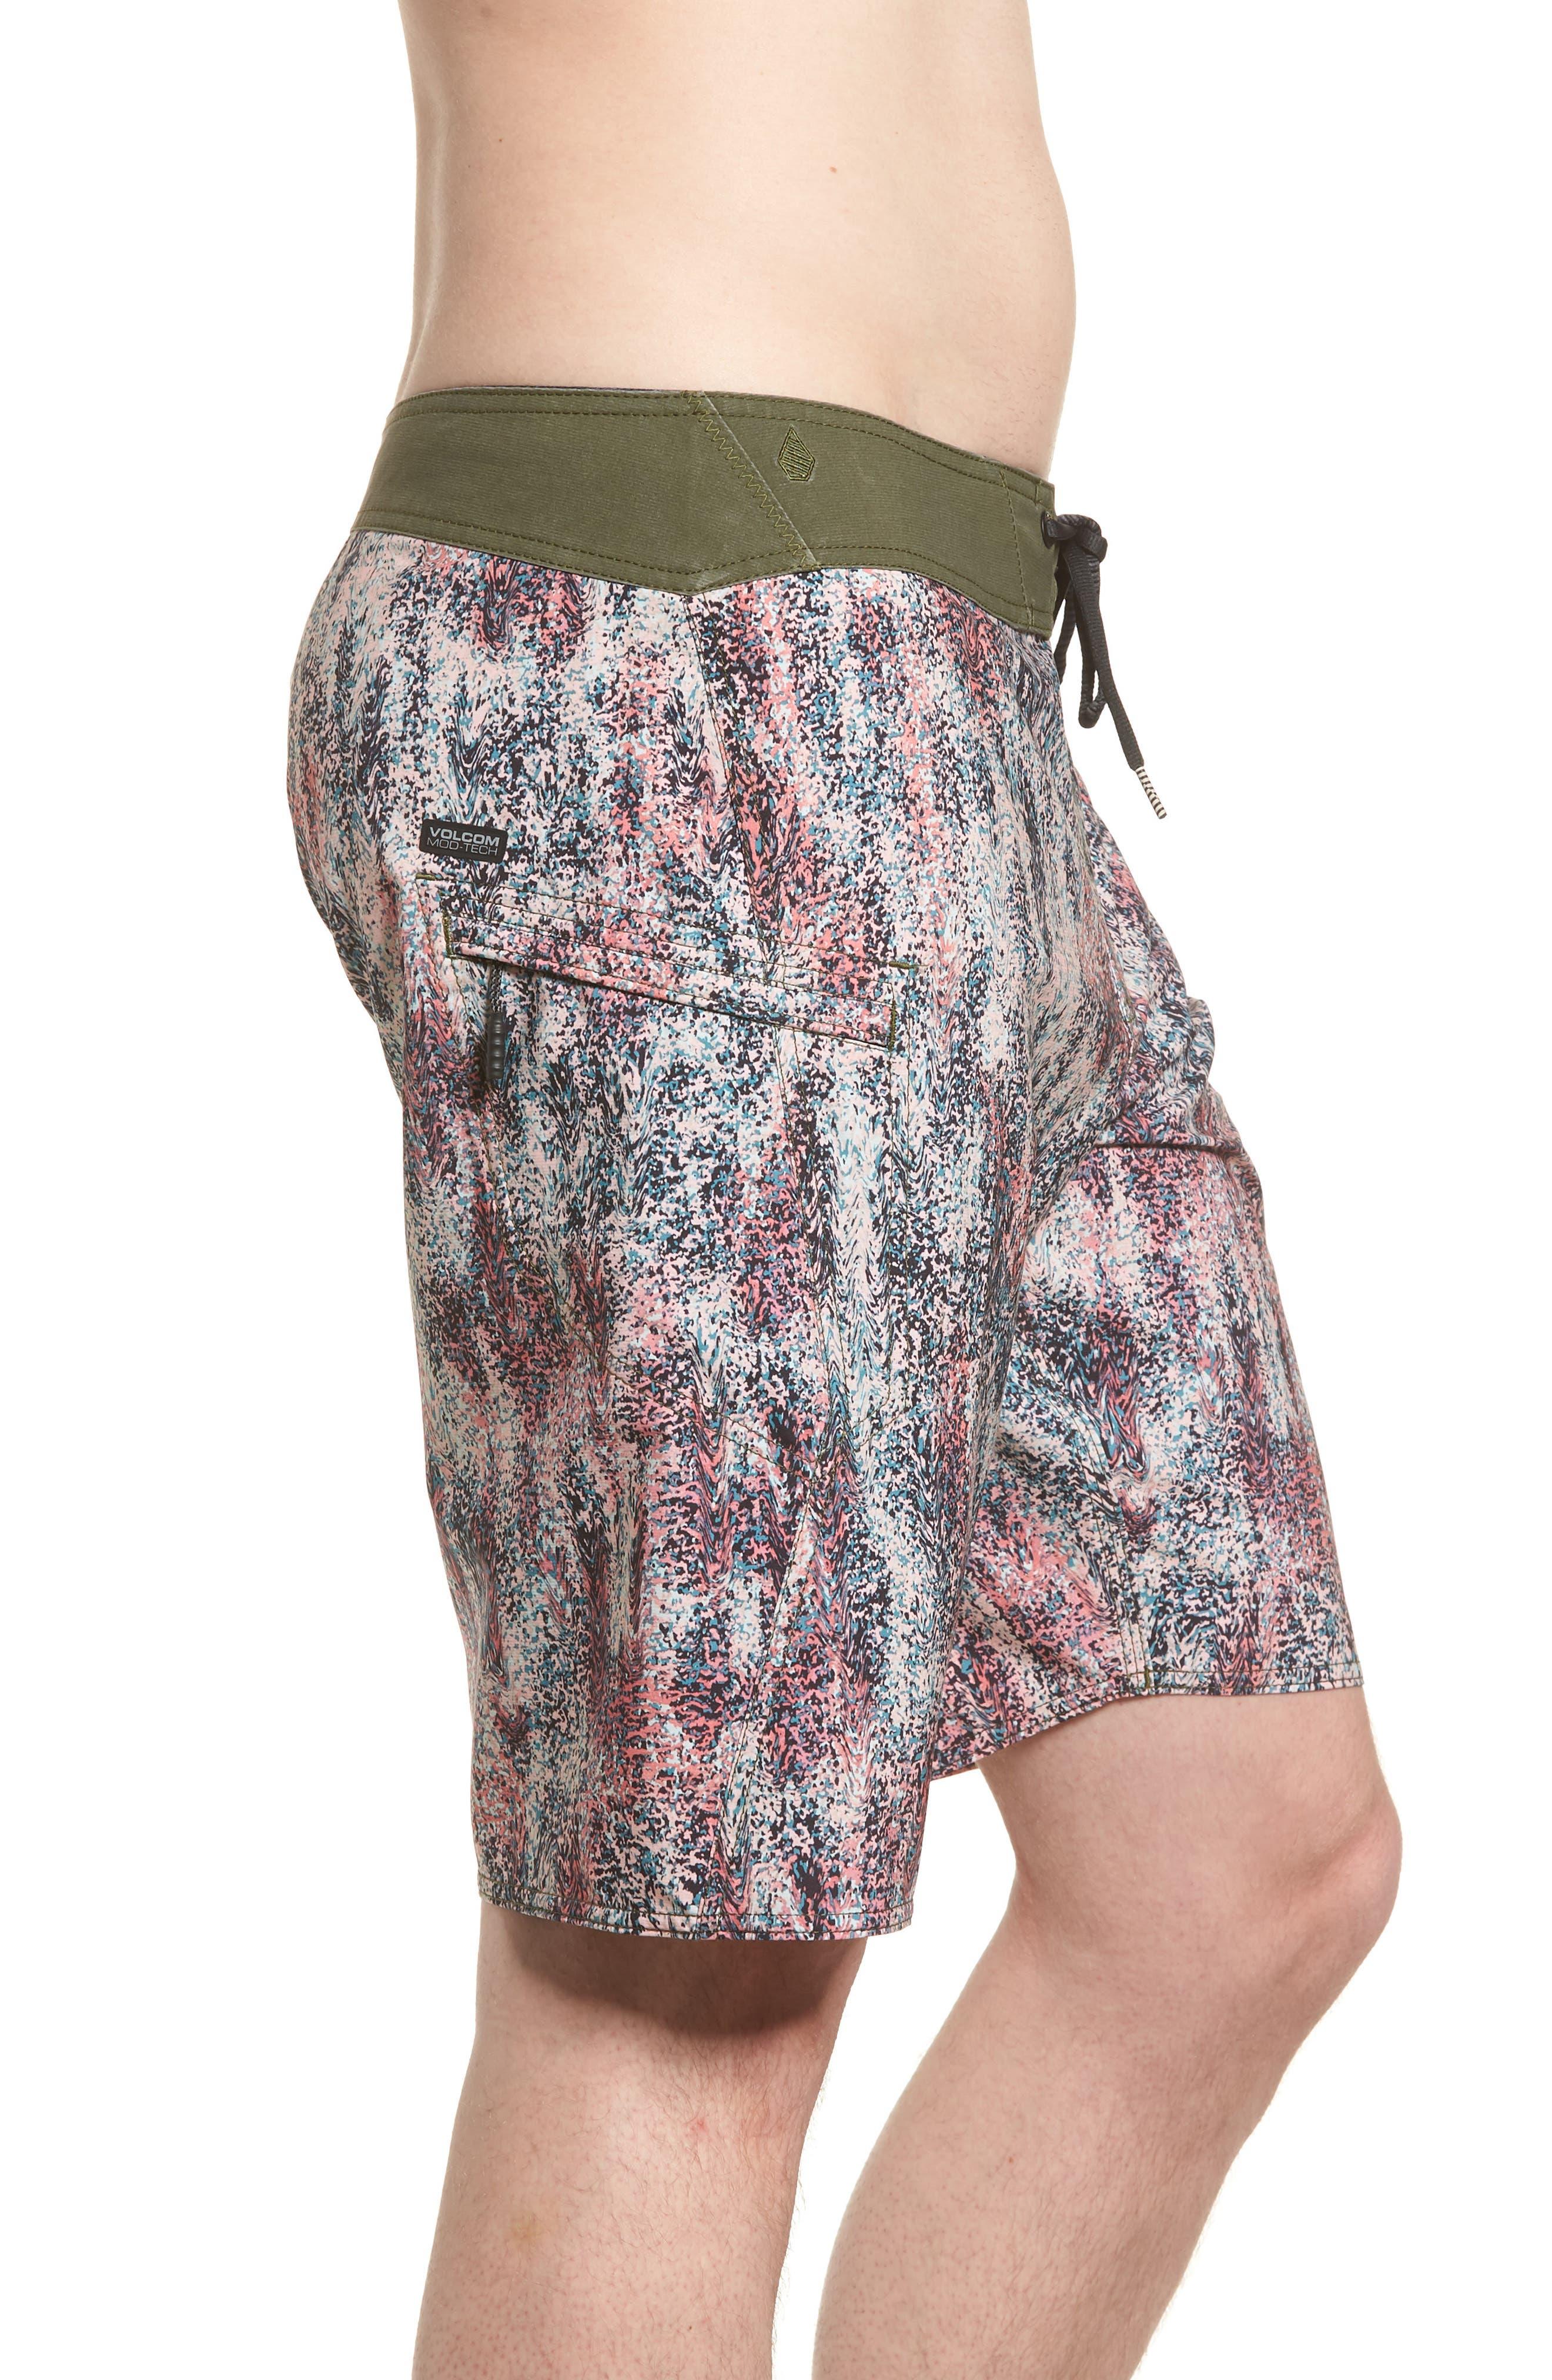 Plasm Mod Board Shorts,                             Alternate thumbnail 3, color,                             020